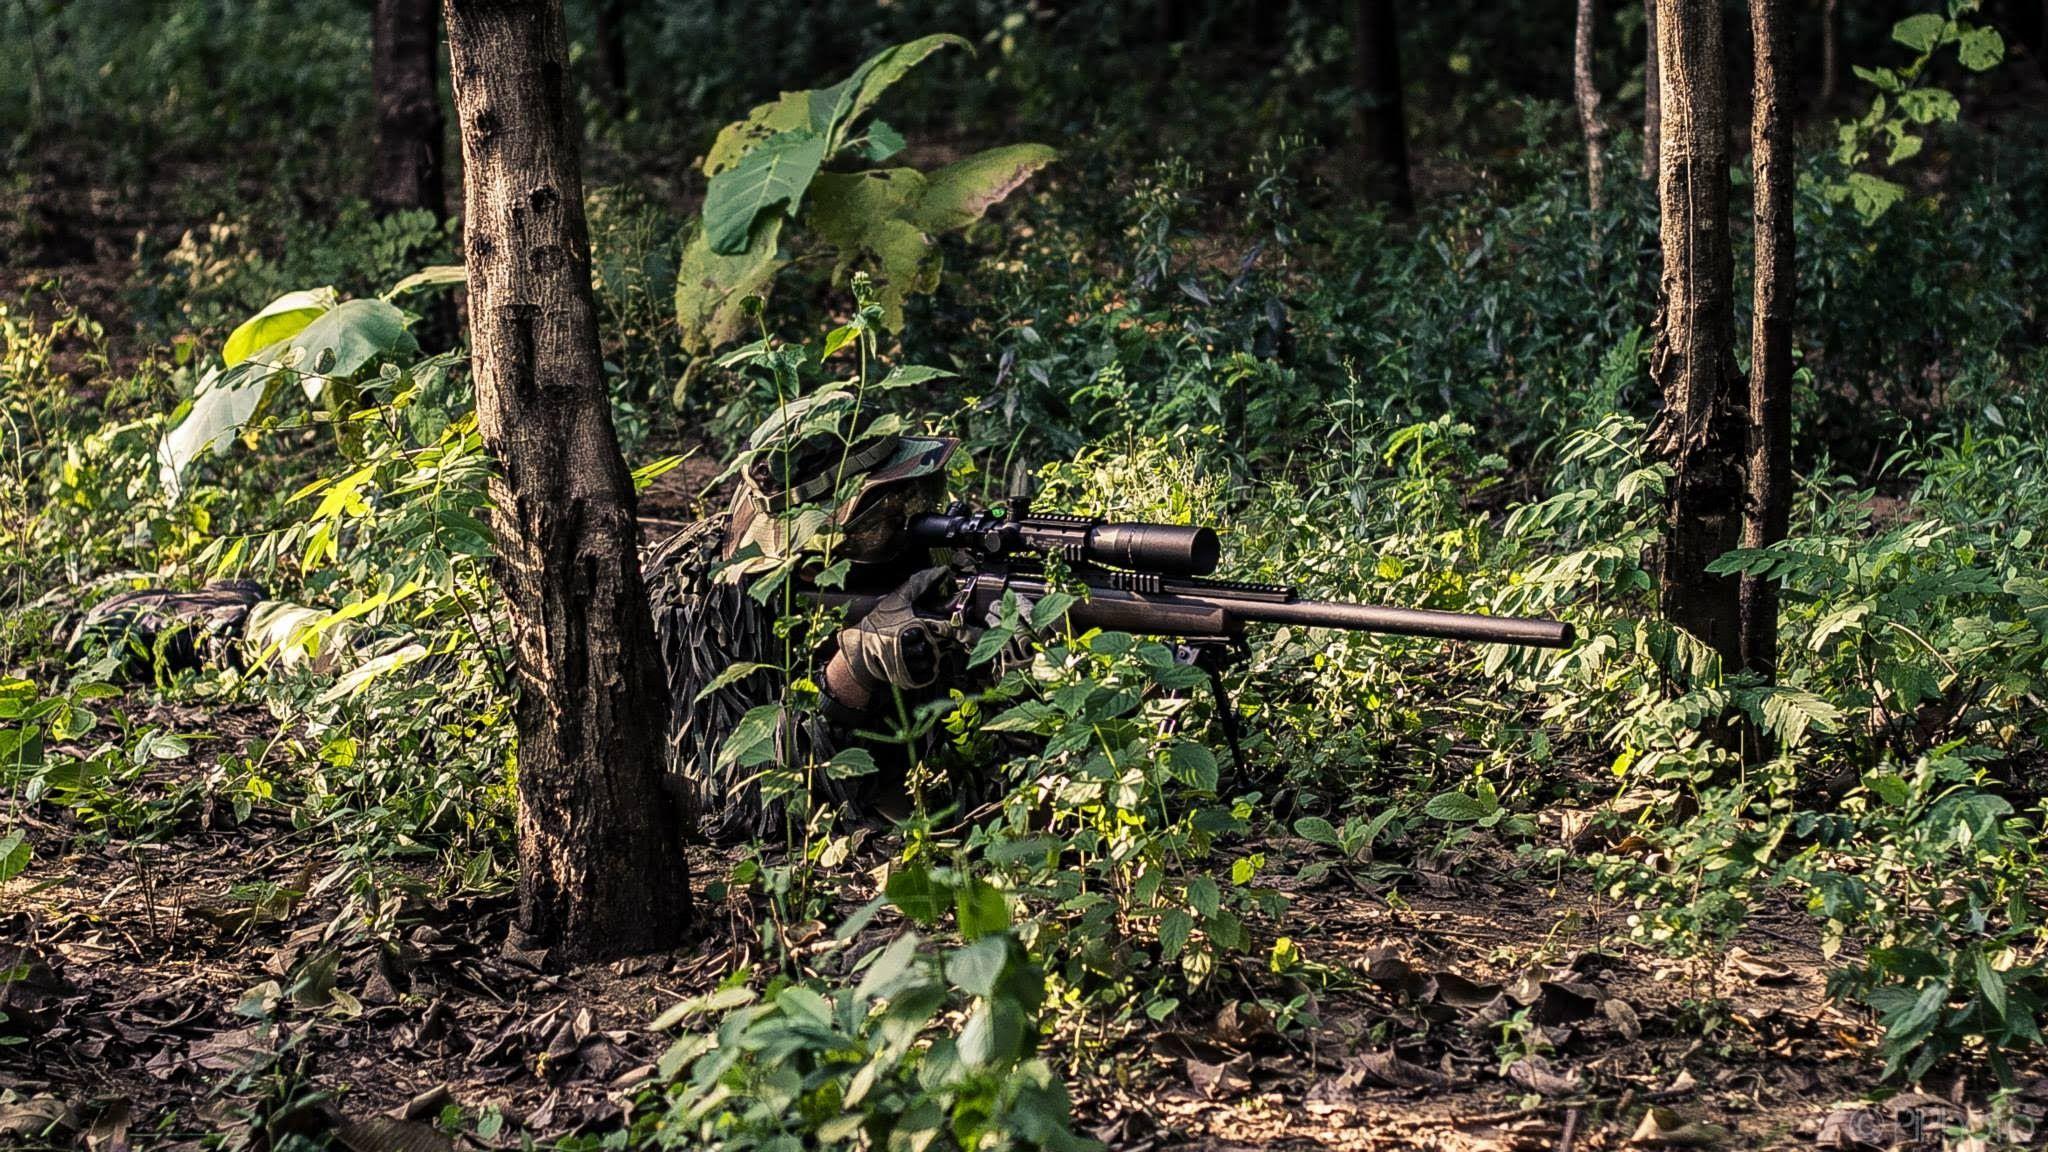 Airsoft player using the Tokyo Marui VSR-10 sniper rifle